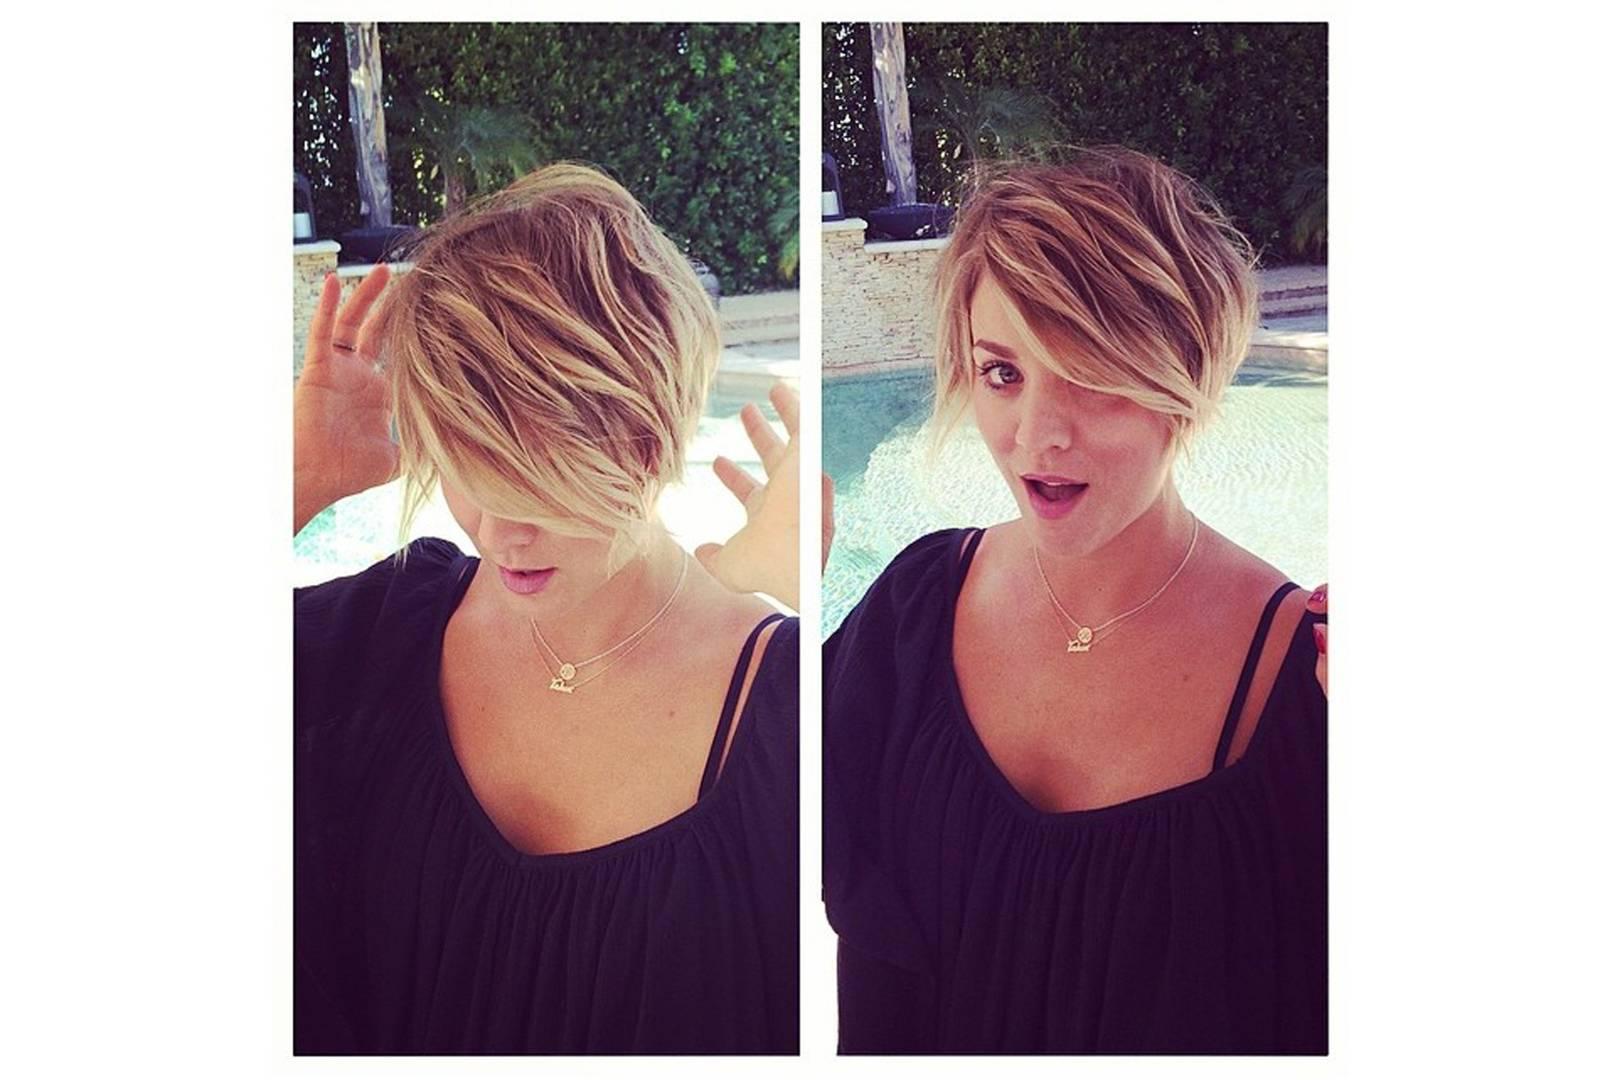 Kaley Cuoco Pixie Cut Hairstyle Photos Glamour Uk